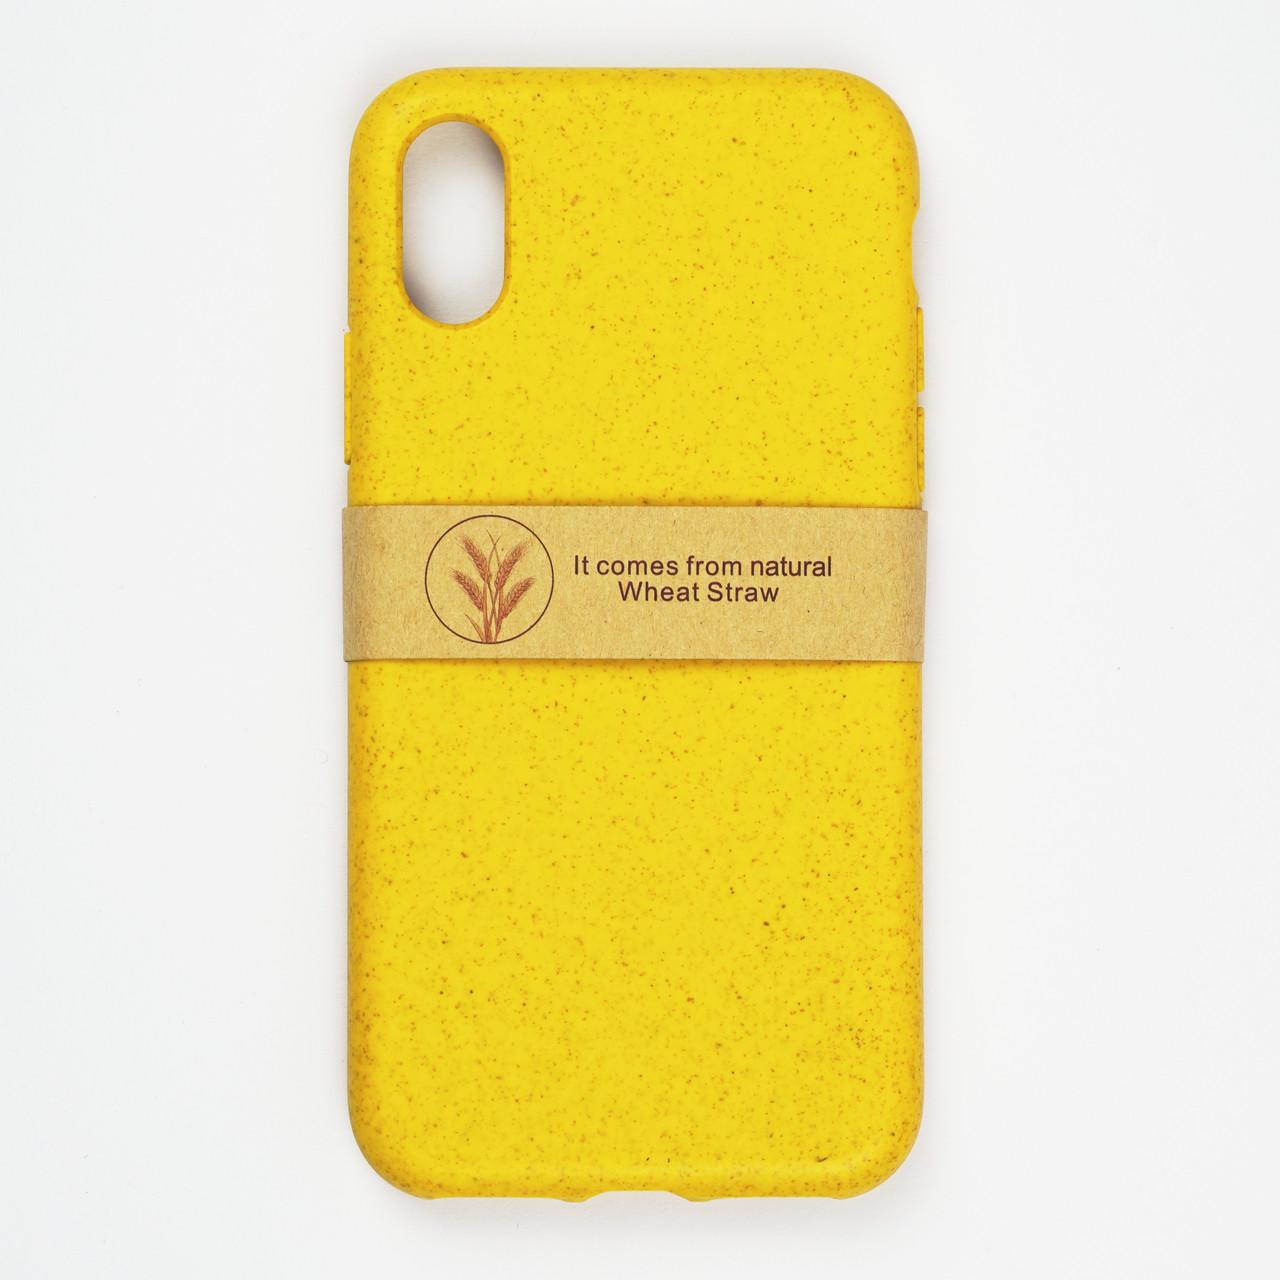 Биоразлагаемый чехол ECO Wheat Straw для iPhone Xs Max Yellow